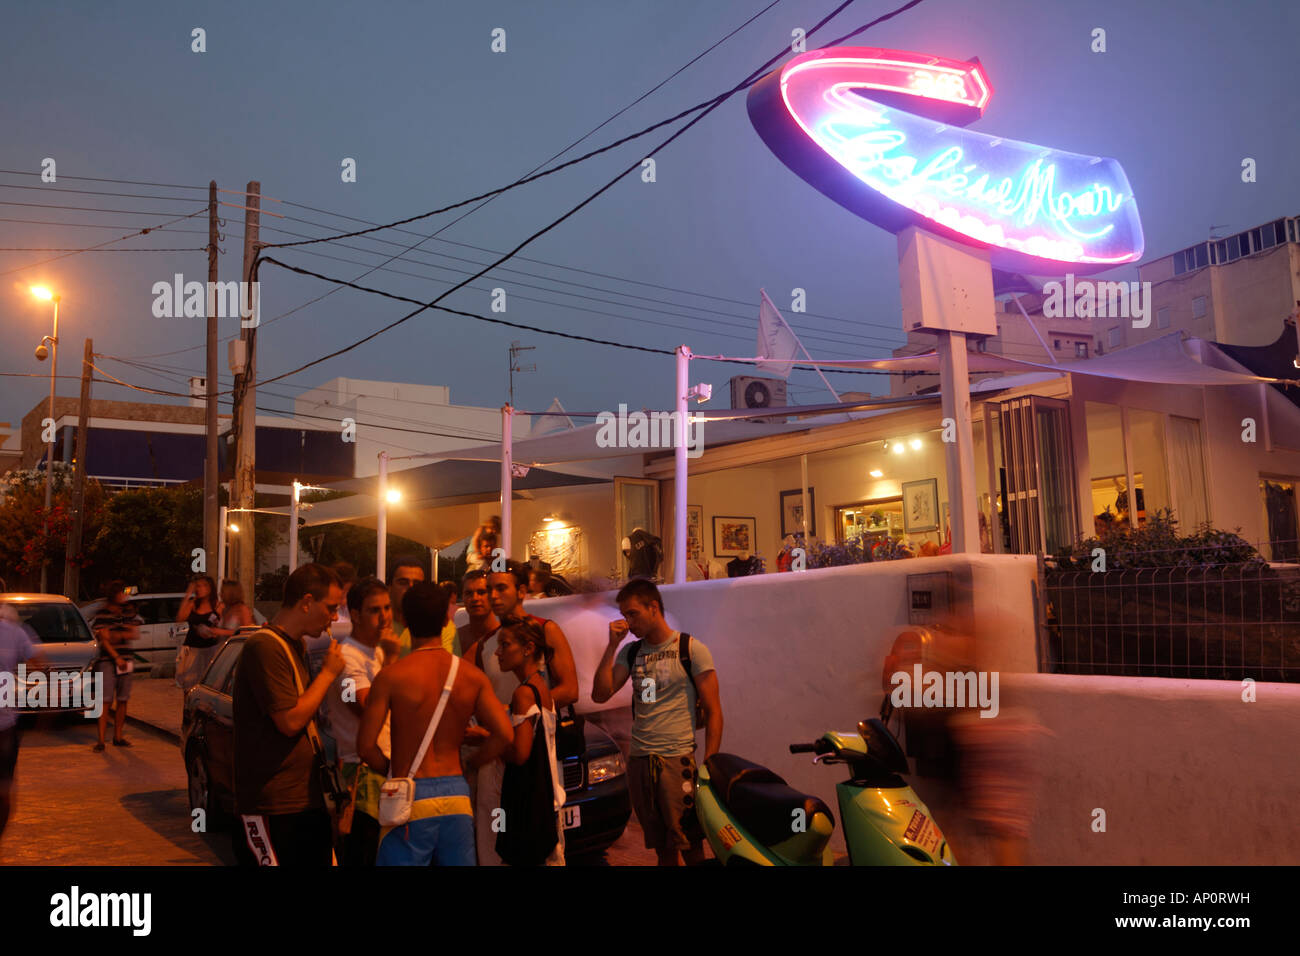 Cafe del Mar Beach full of people after sunset at dusk, Ibiza / Eivissa, Balearic Islands, Spain, Europe, EU - Stock Image